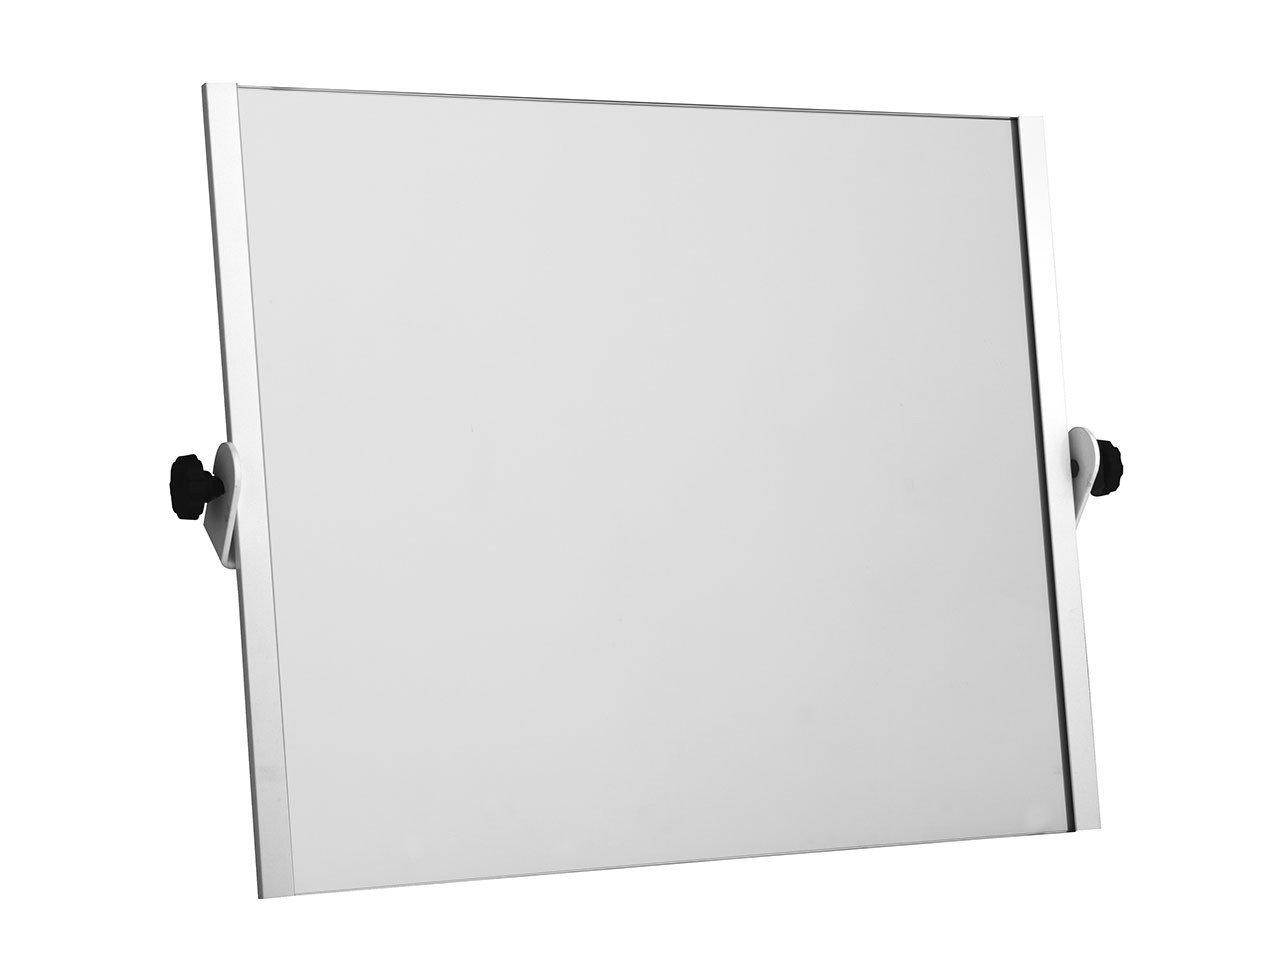 sicura specchio basculante 60x50 bianco iperceramica